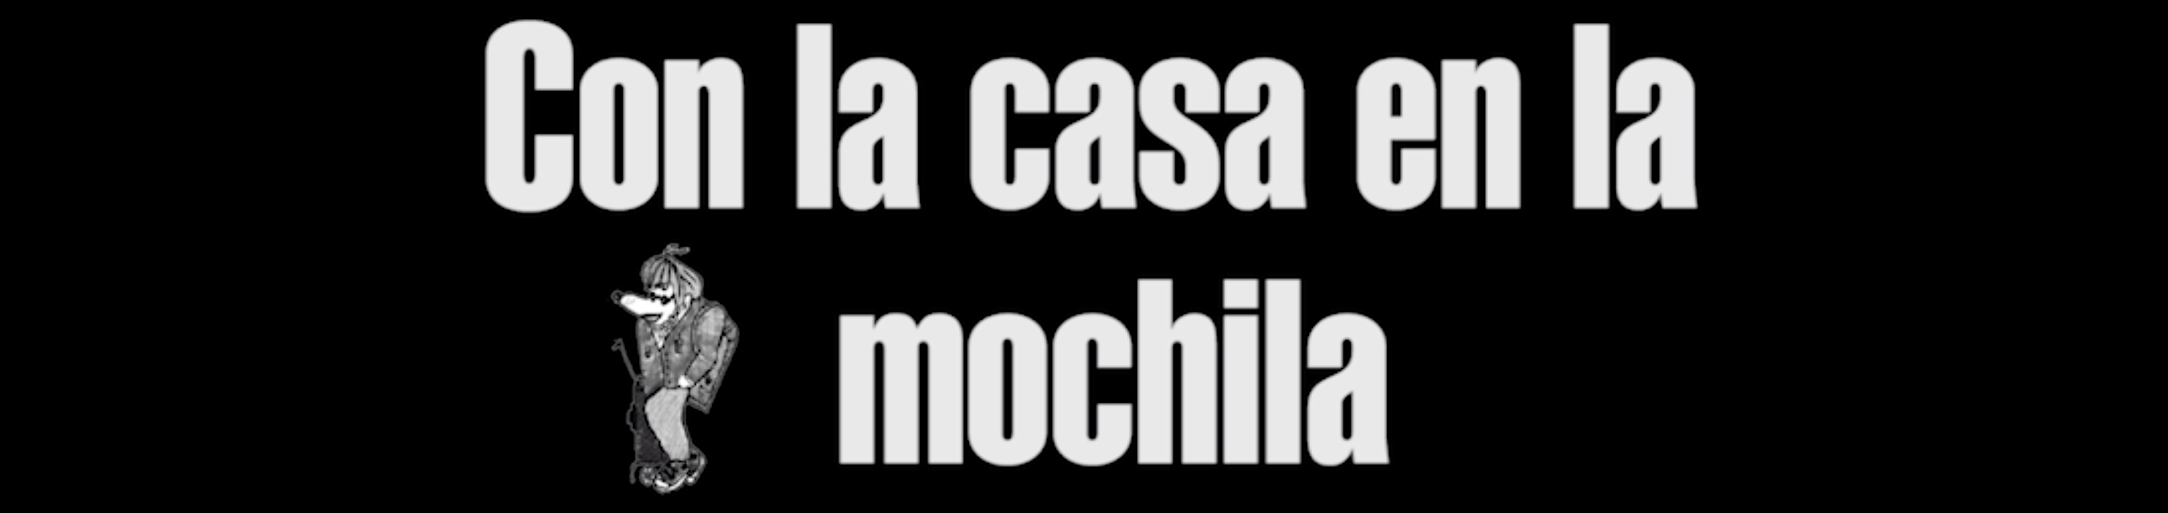 cropped-cON-LA-CASA-EN-LA-MOCHILA-LOGO.png